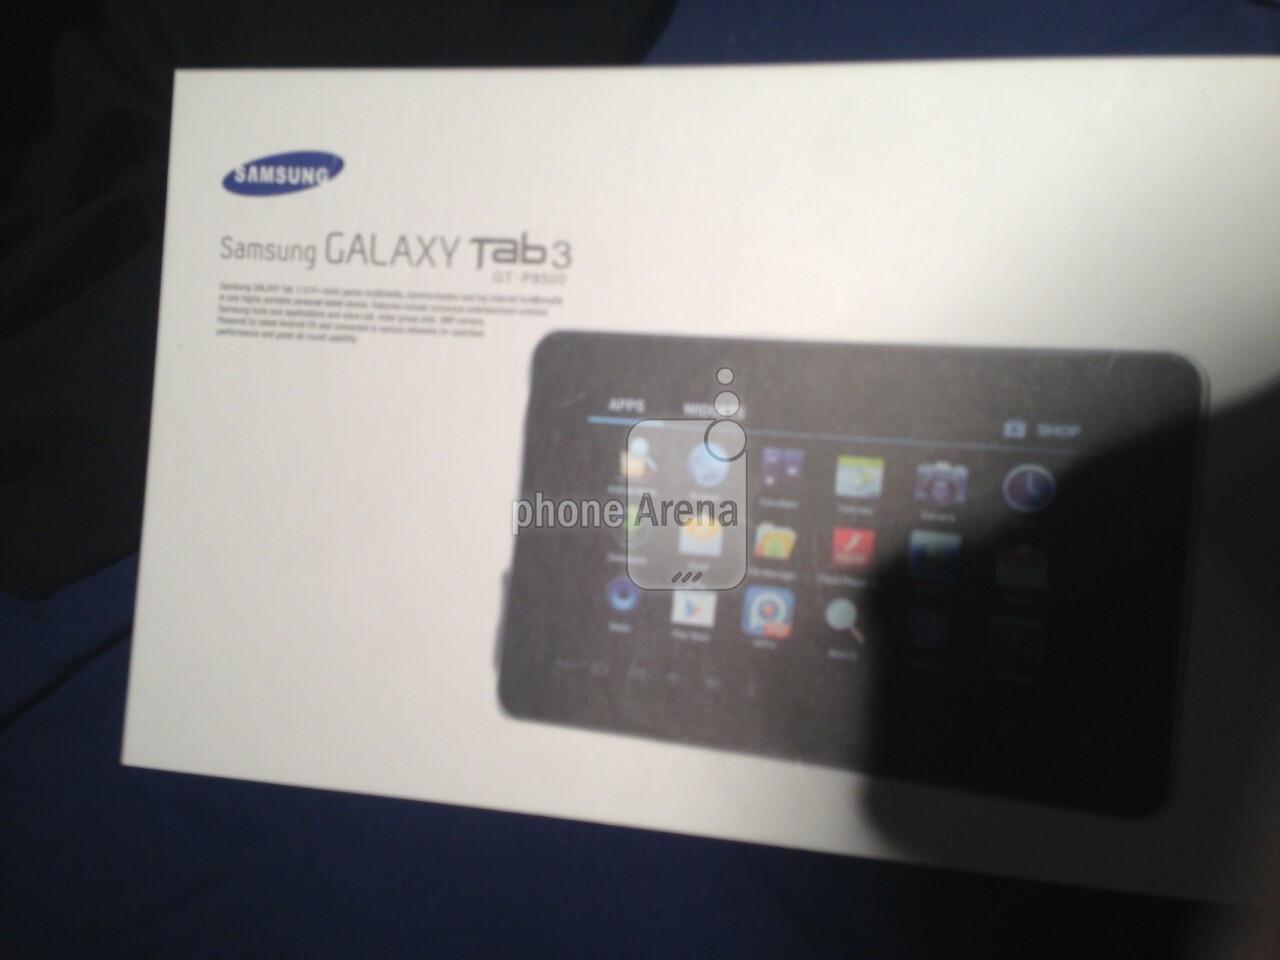 Alleged Samsung Galaxy Tab 3 pics appear ahead of MWC